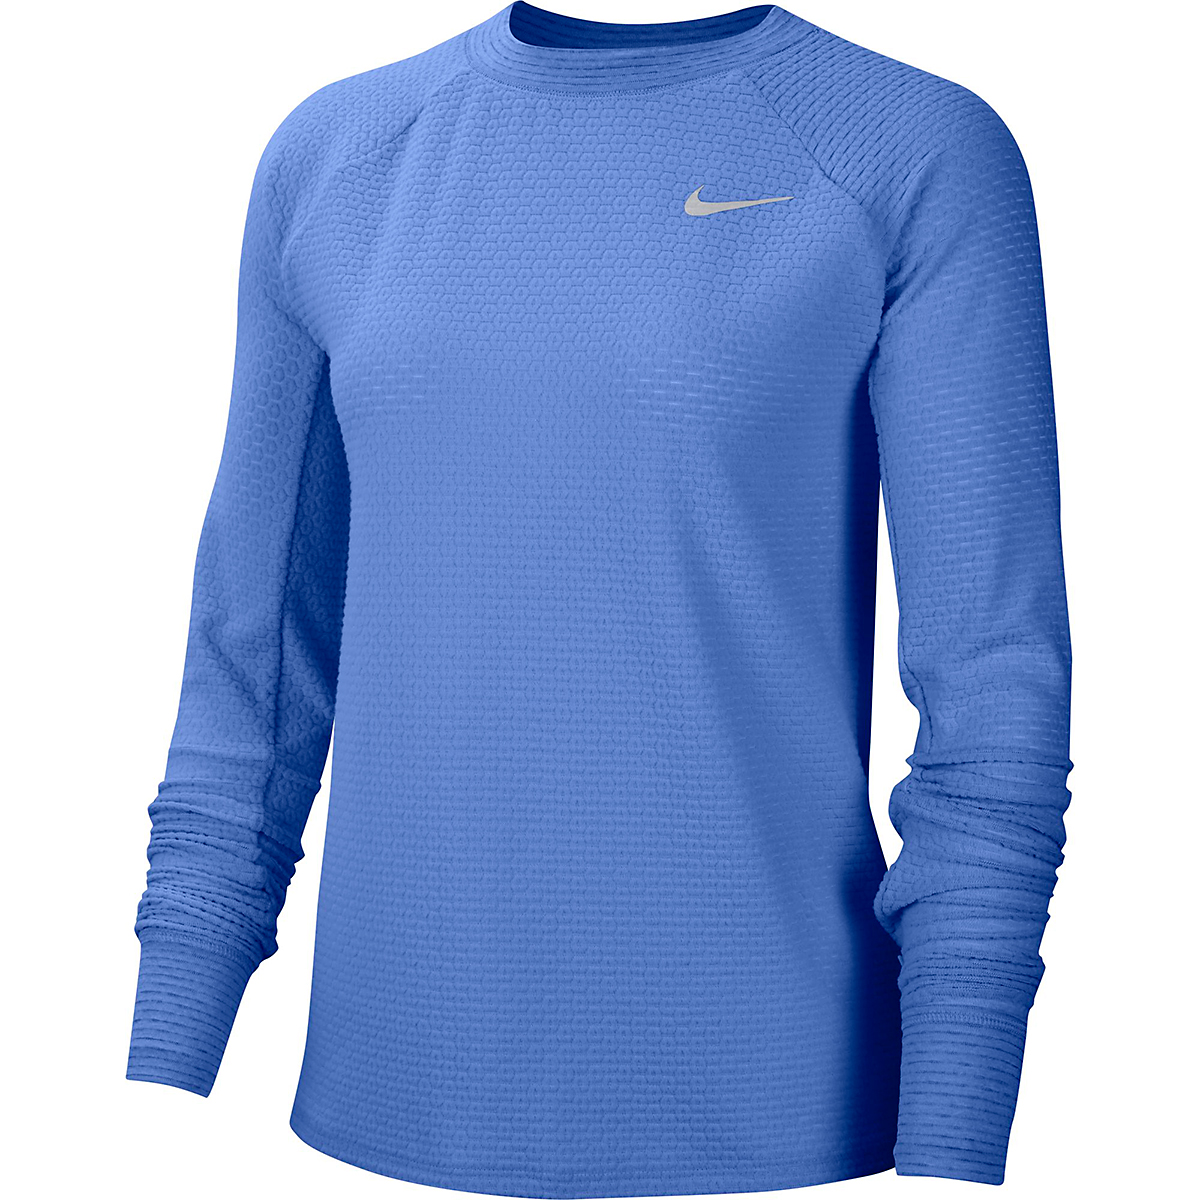 Women's Nike Sphere Crew Long Sleeve Shirt - Color: Royal Pulse/Reflective Silver - Size: XS, Royal Pulse/Reflective Silver, large, image 1